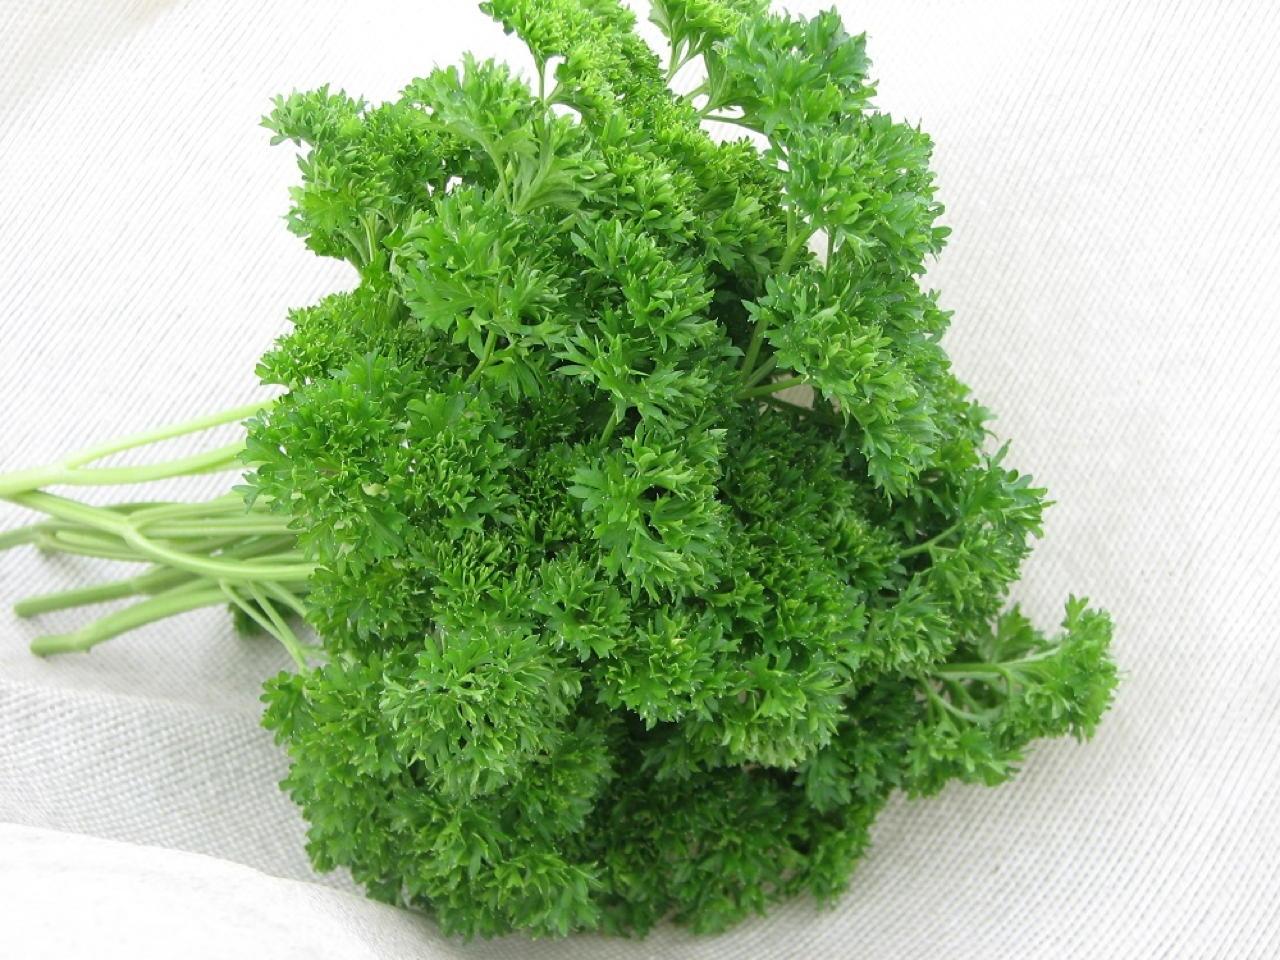 Prezzemolo Messis - Plantgest.com